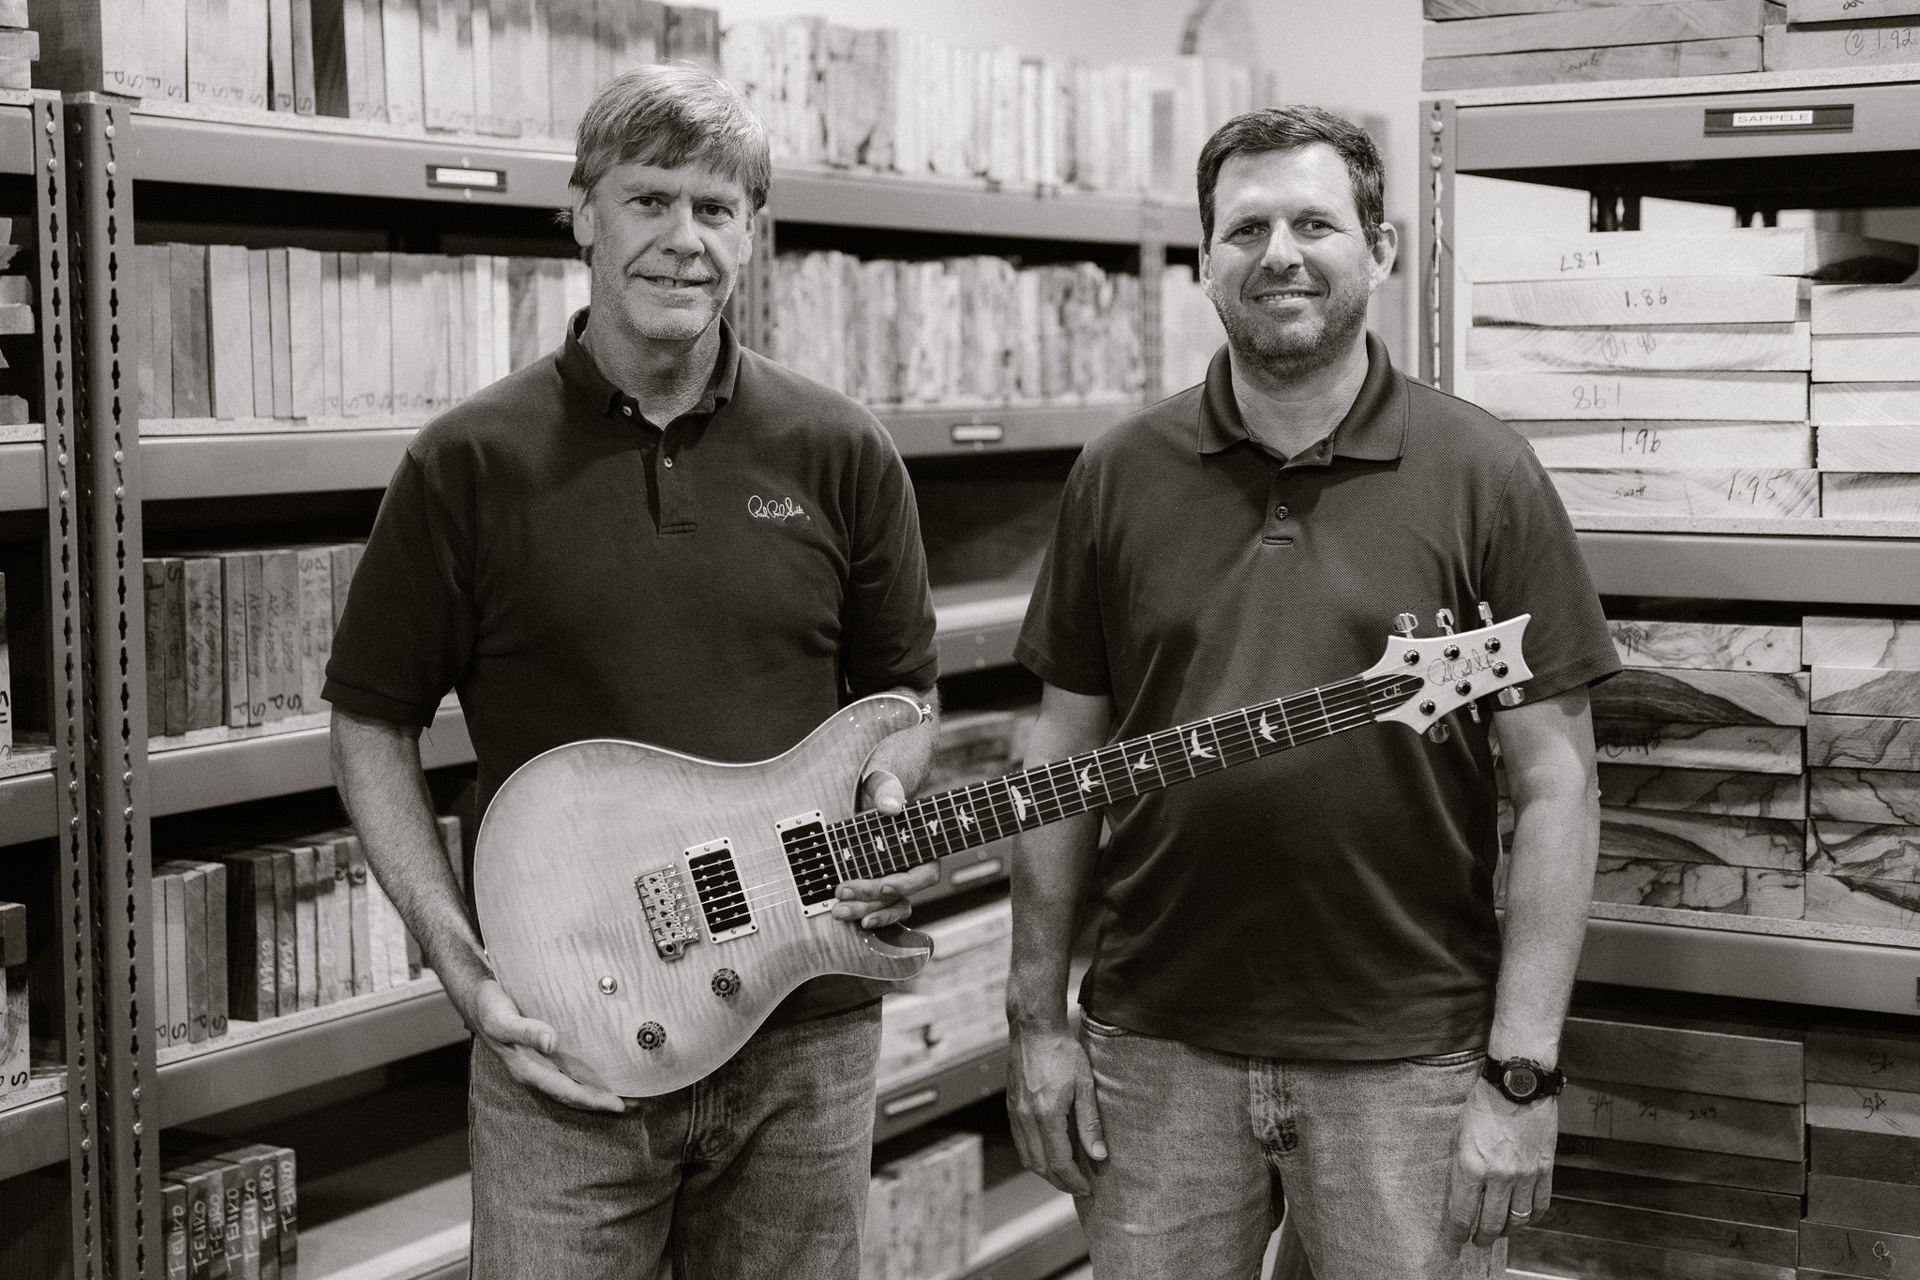 Jack Higginbotham and Rob Carhart